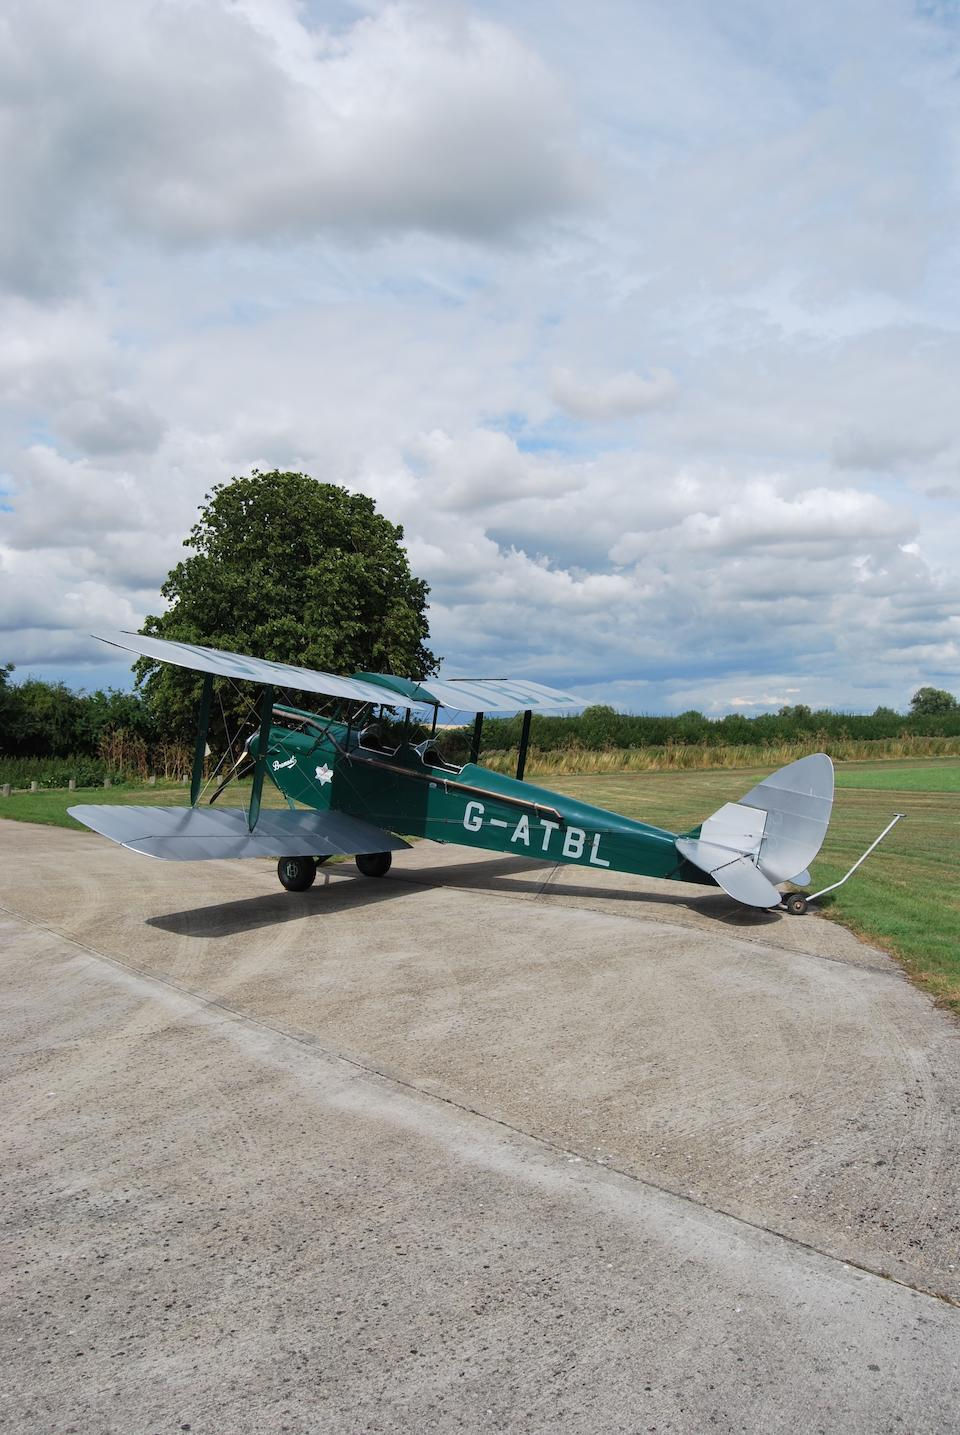 1933 De Havilland DH60G Gipsy Moth